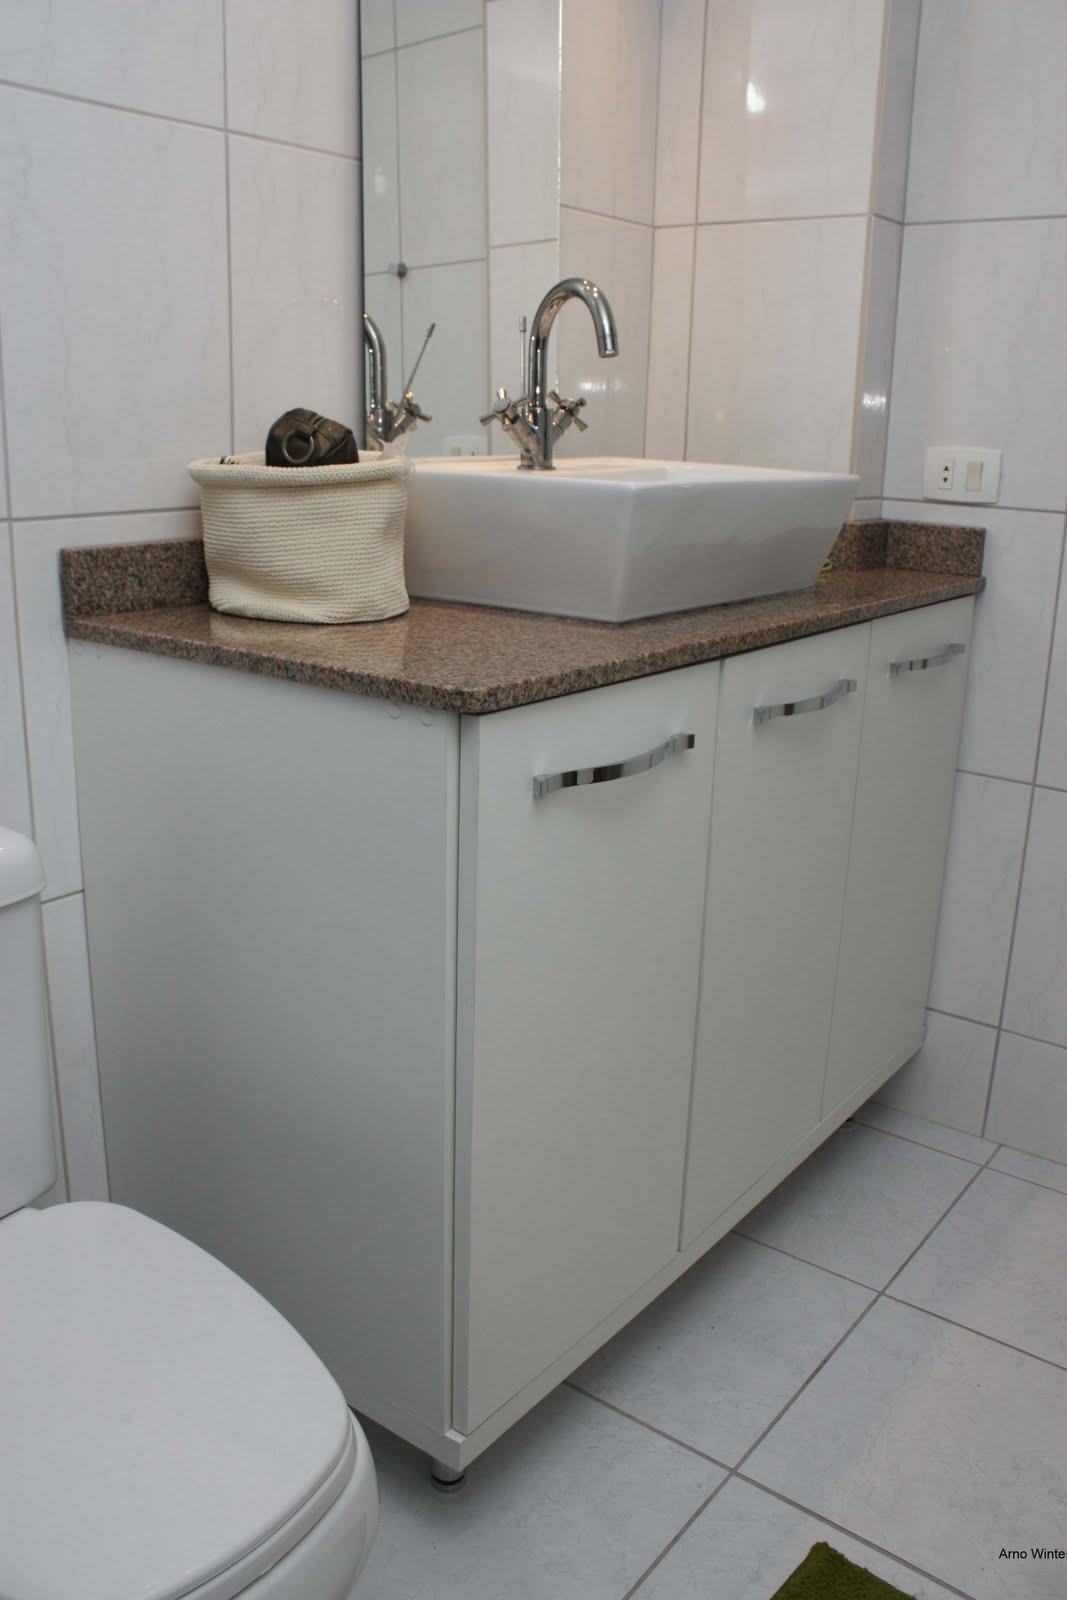 Arno Winter Móveis sobmedida Armário de banheiro -> Armario Lateral Banheiro